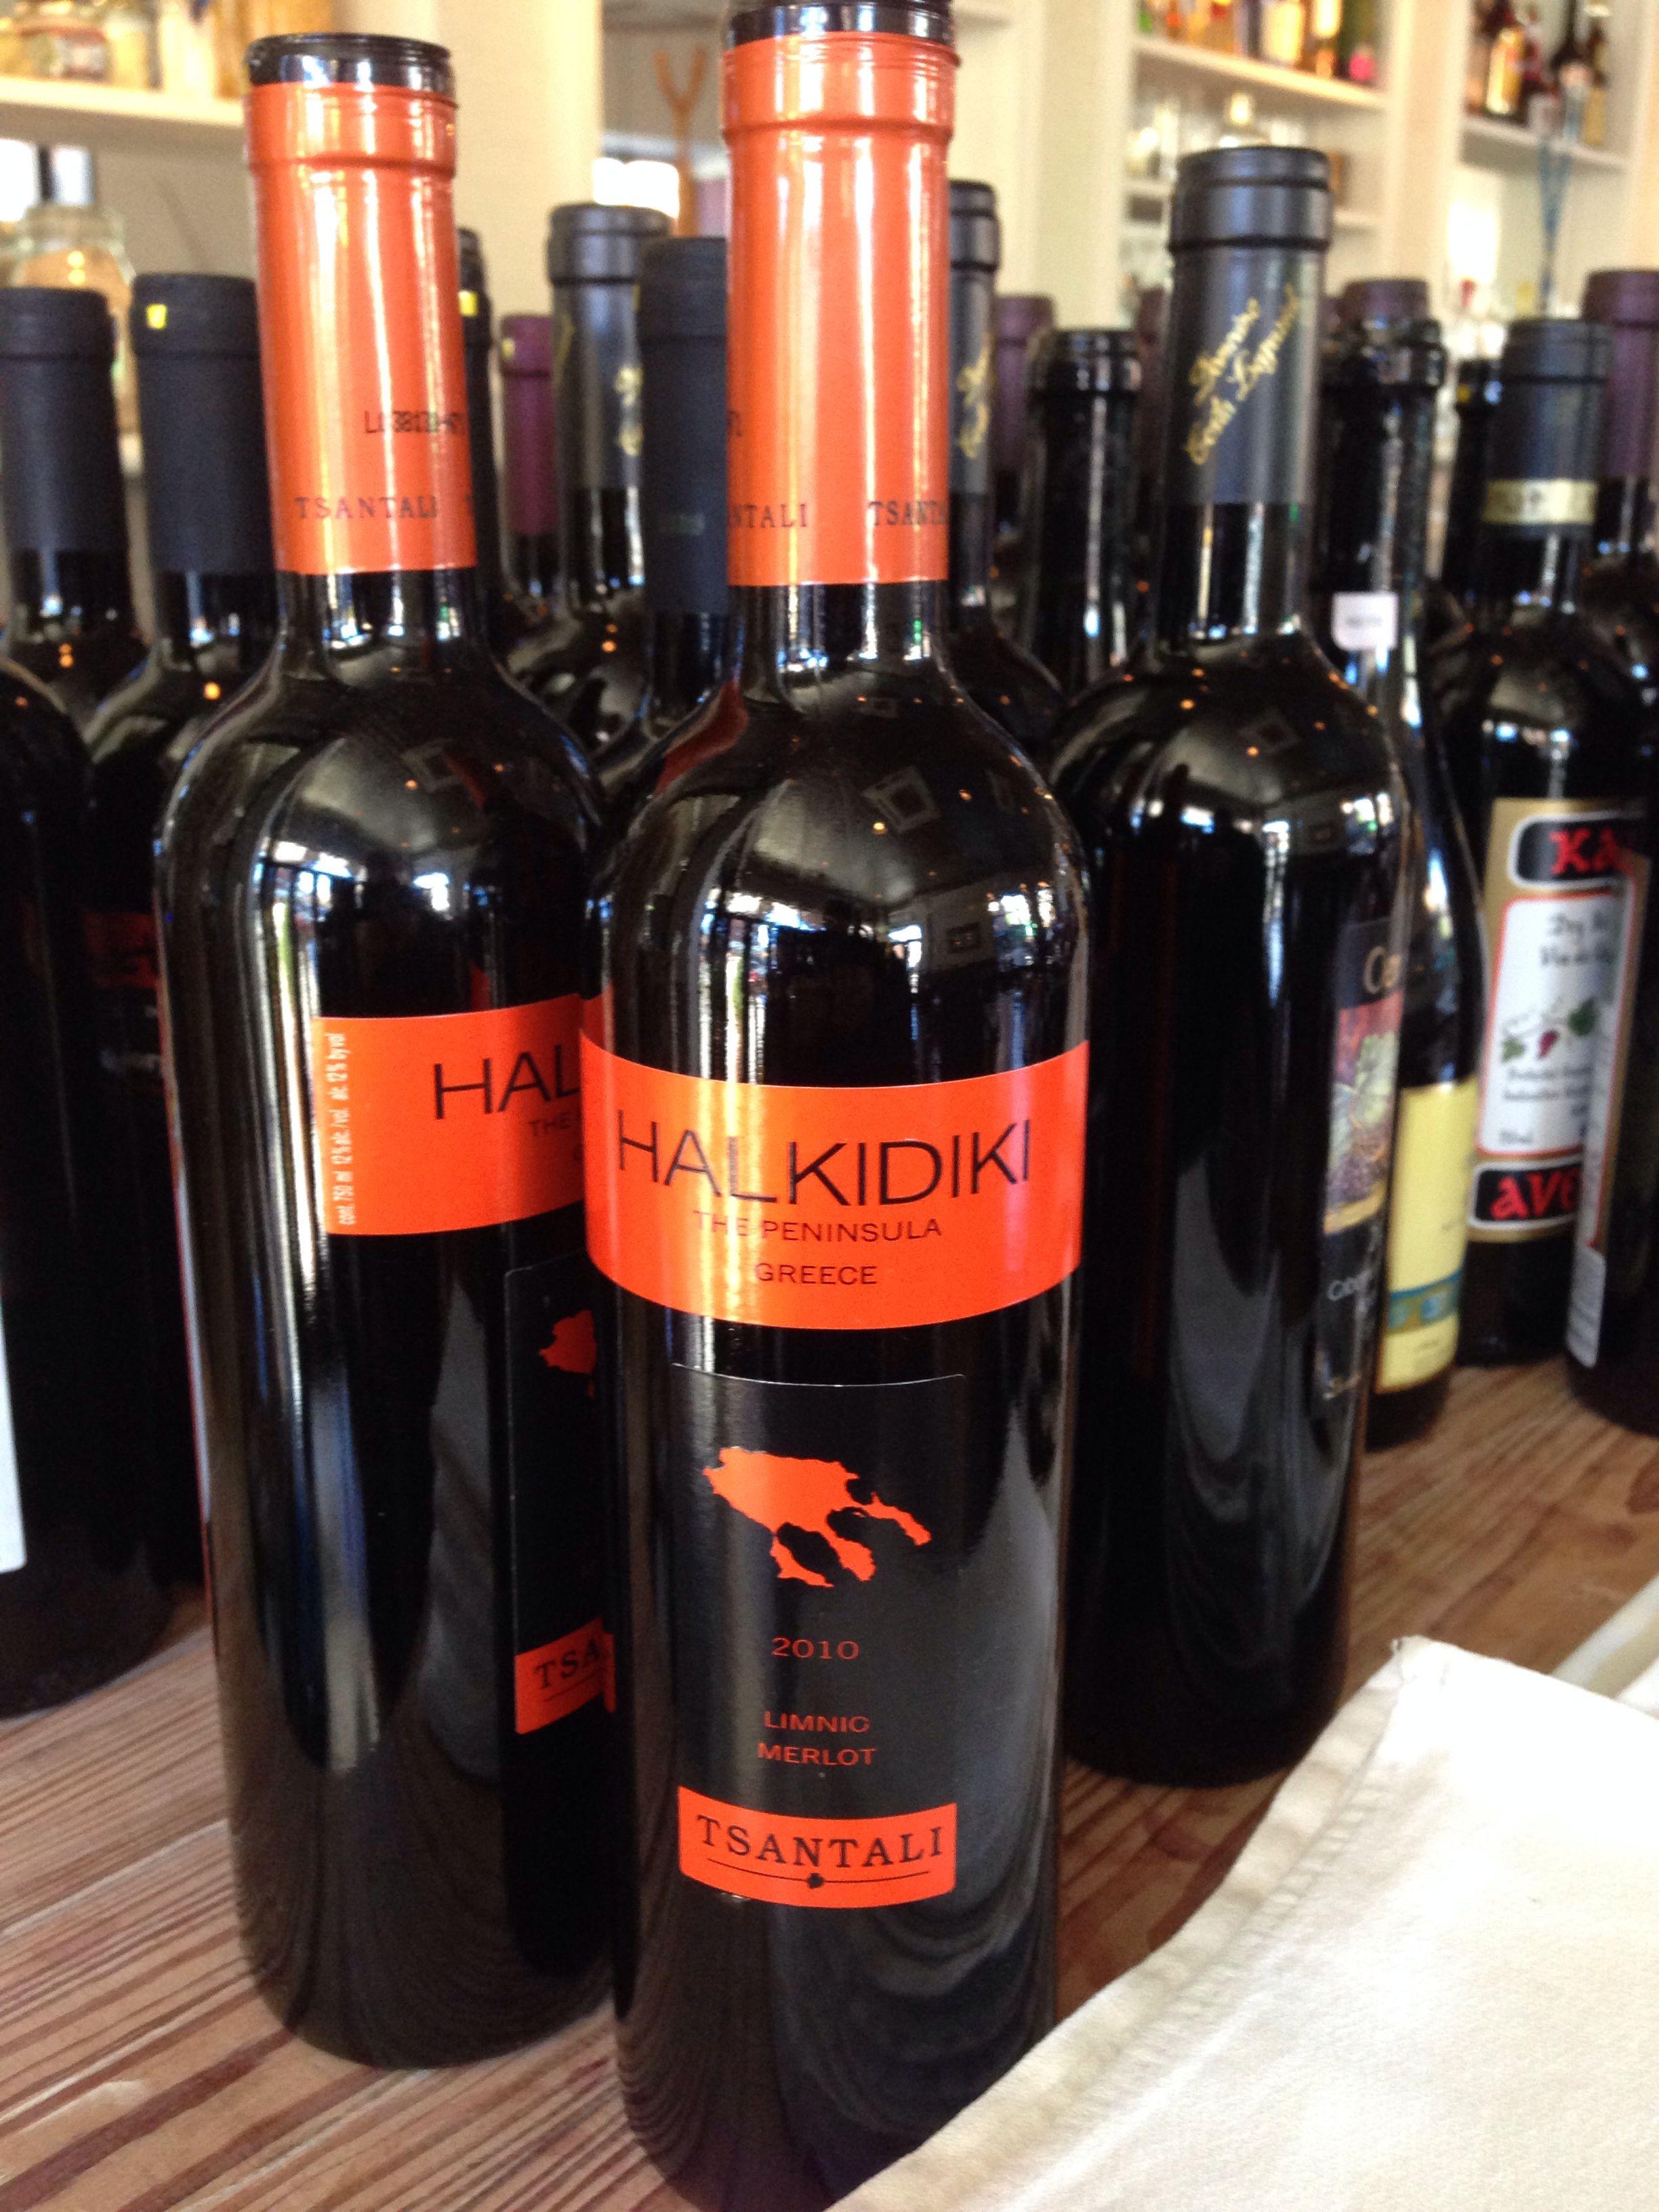 Greek Wine Greek Wine Wine And Liquor Greek